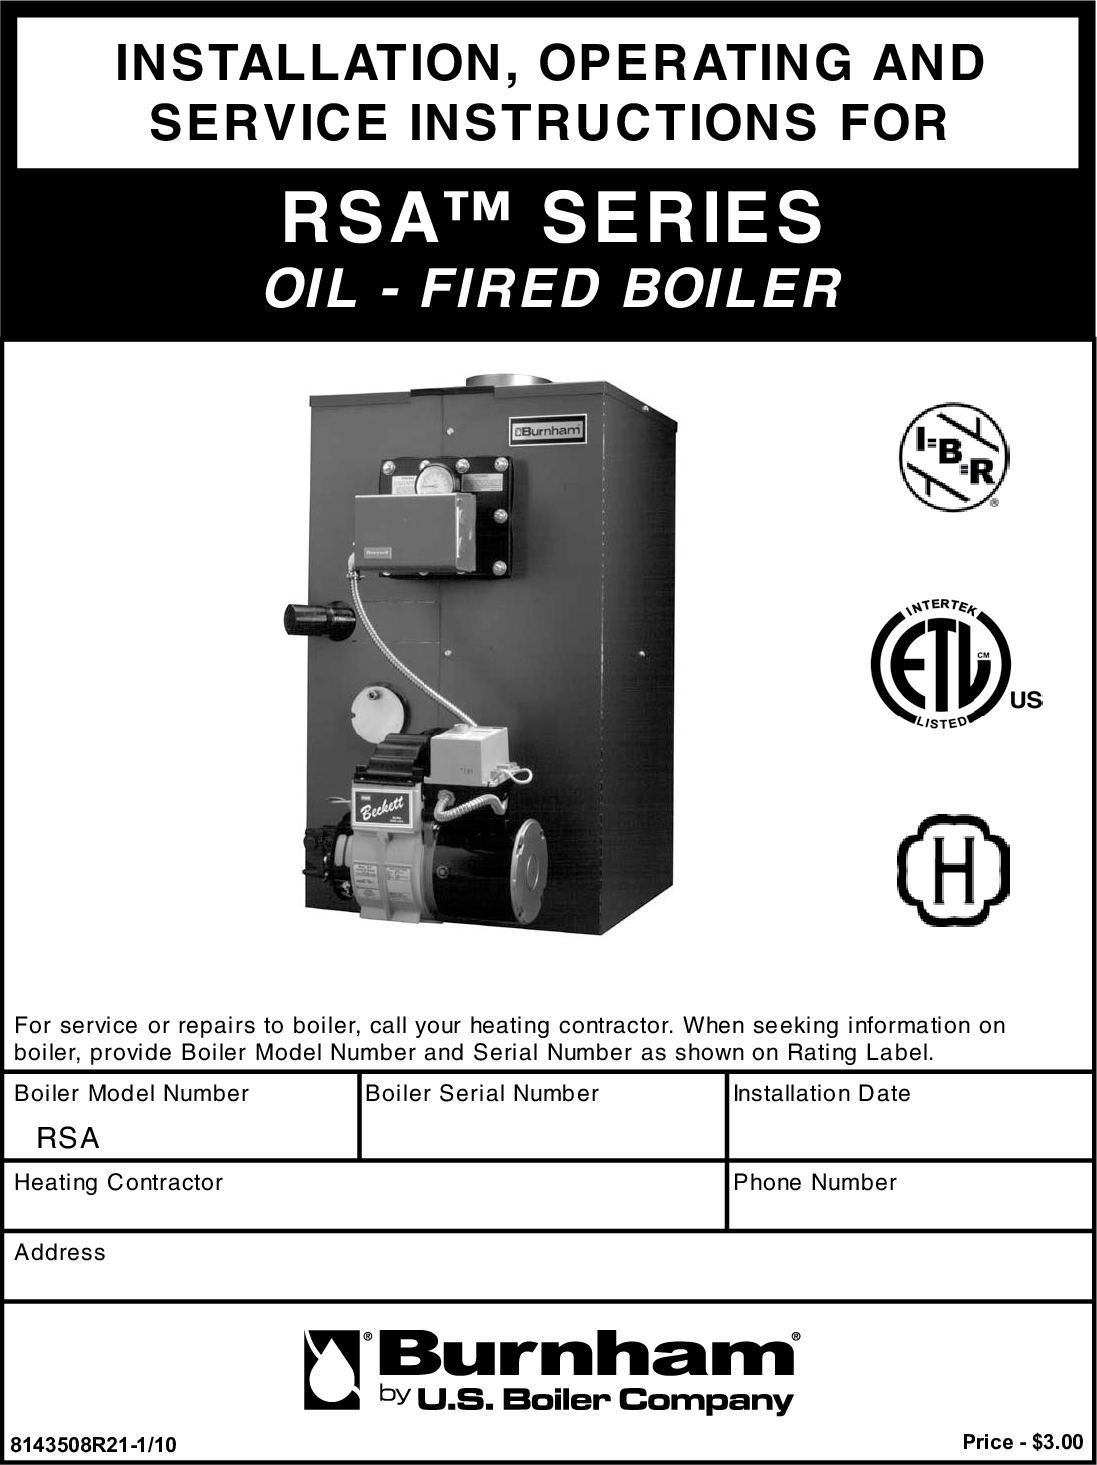 Hotpoint RSA User Manual To The A055a201 6e9b 4616 9fba eb9cdf113619